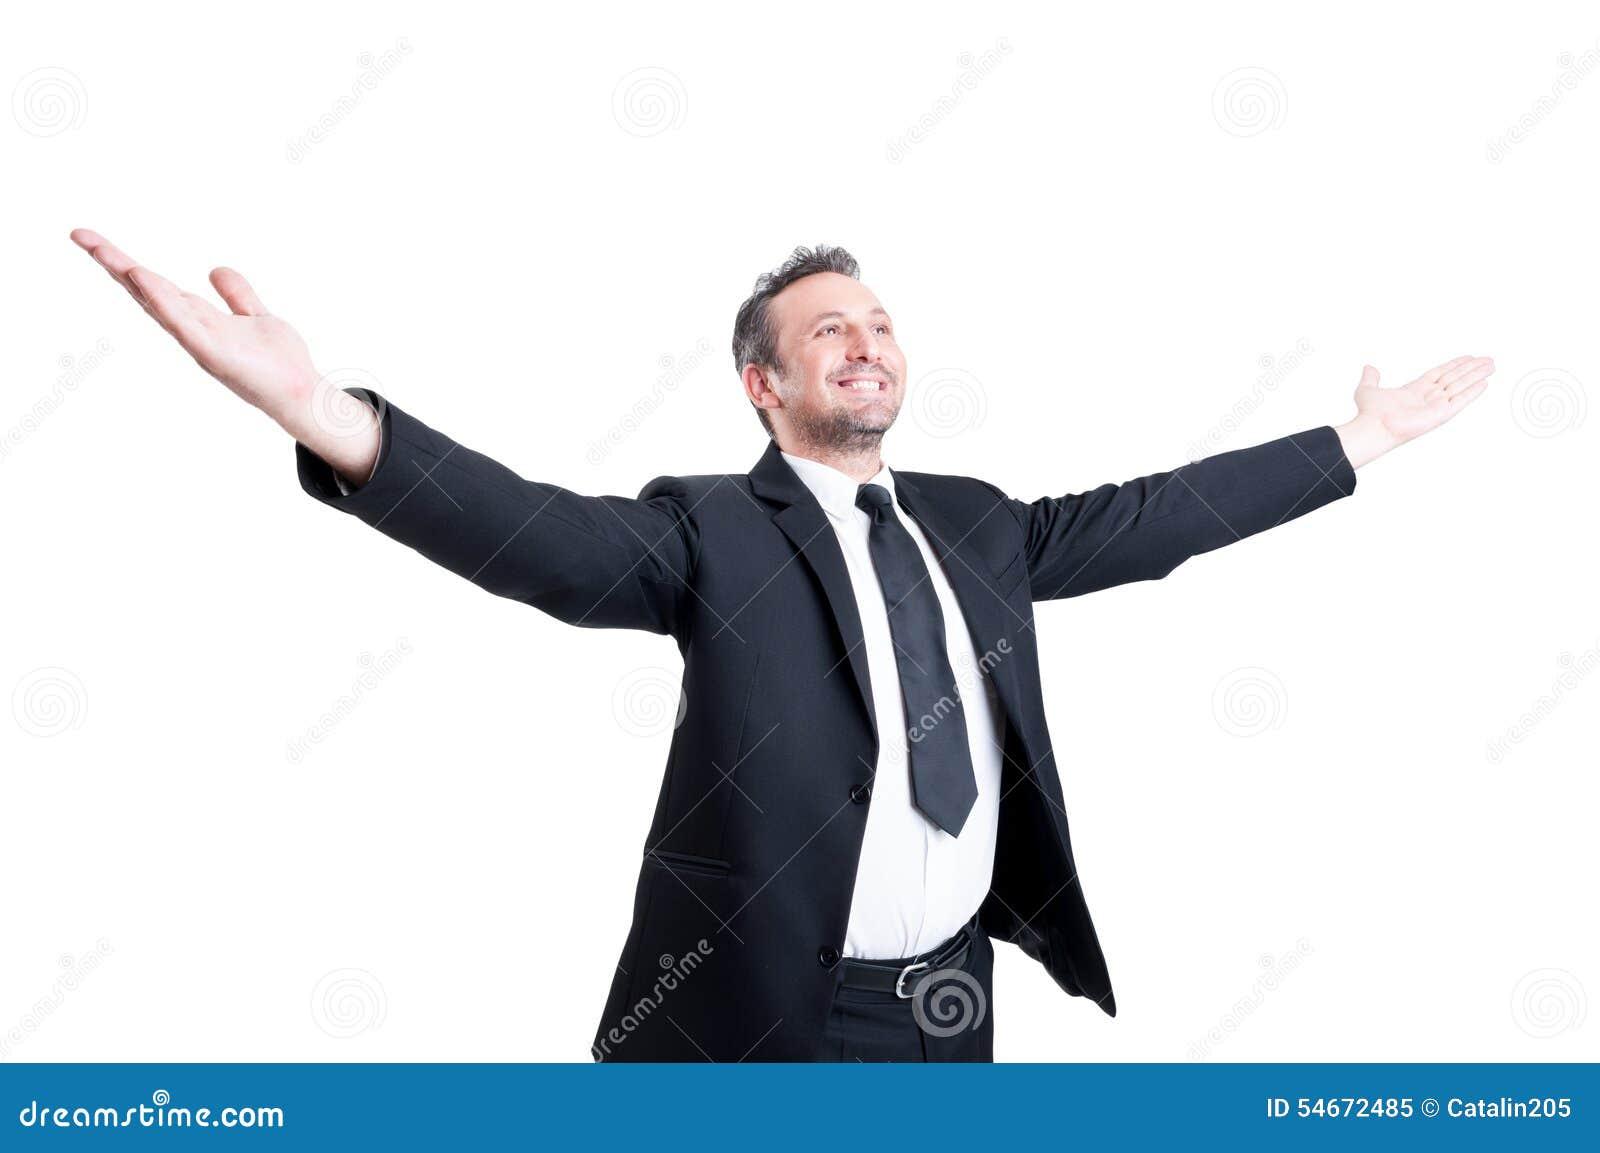 Male supermarket employer holding arms wide open like winner stock.